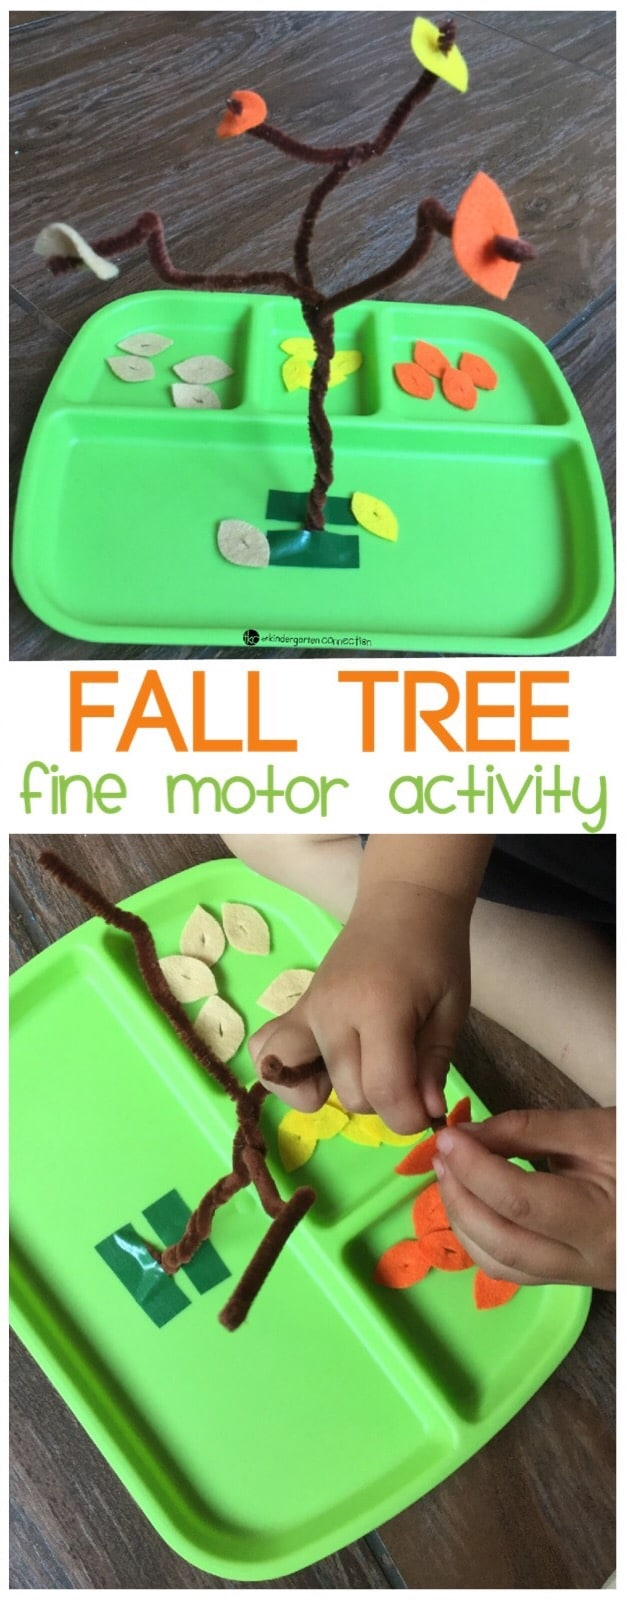 Fall Tree Fine Motor Activity - The Kindergarten Connection